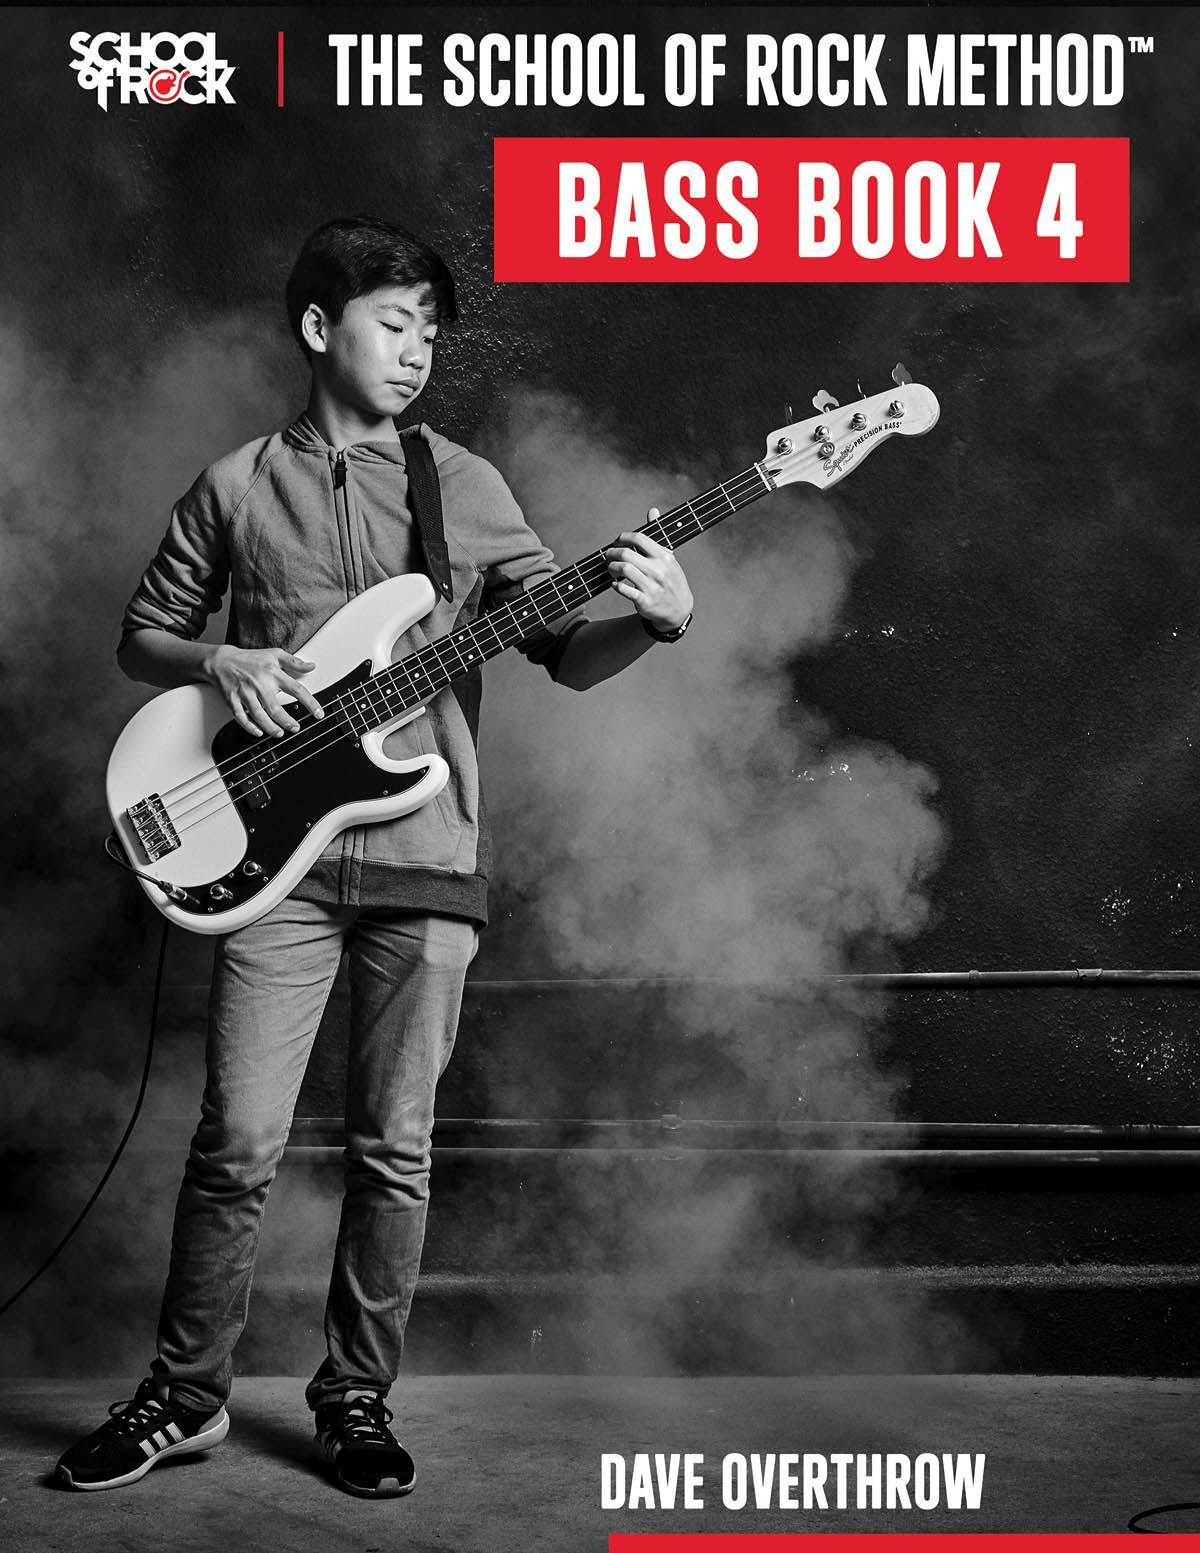 Dave Overthrow: The School of Rock Method - Bass Book 4: Bass Guitar Solo: